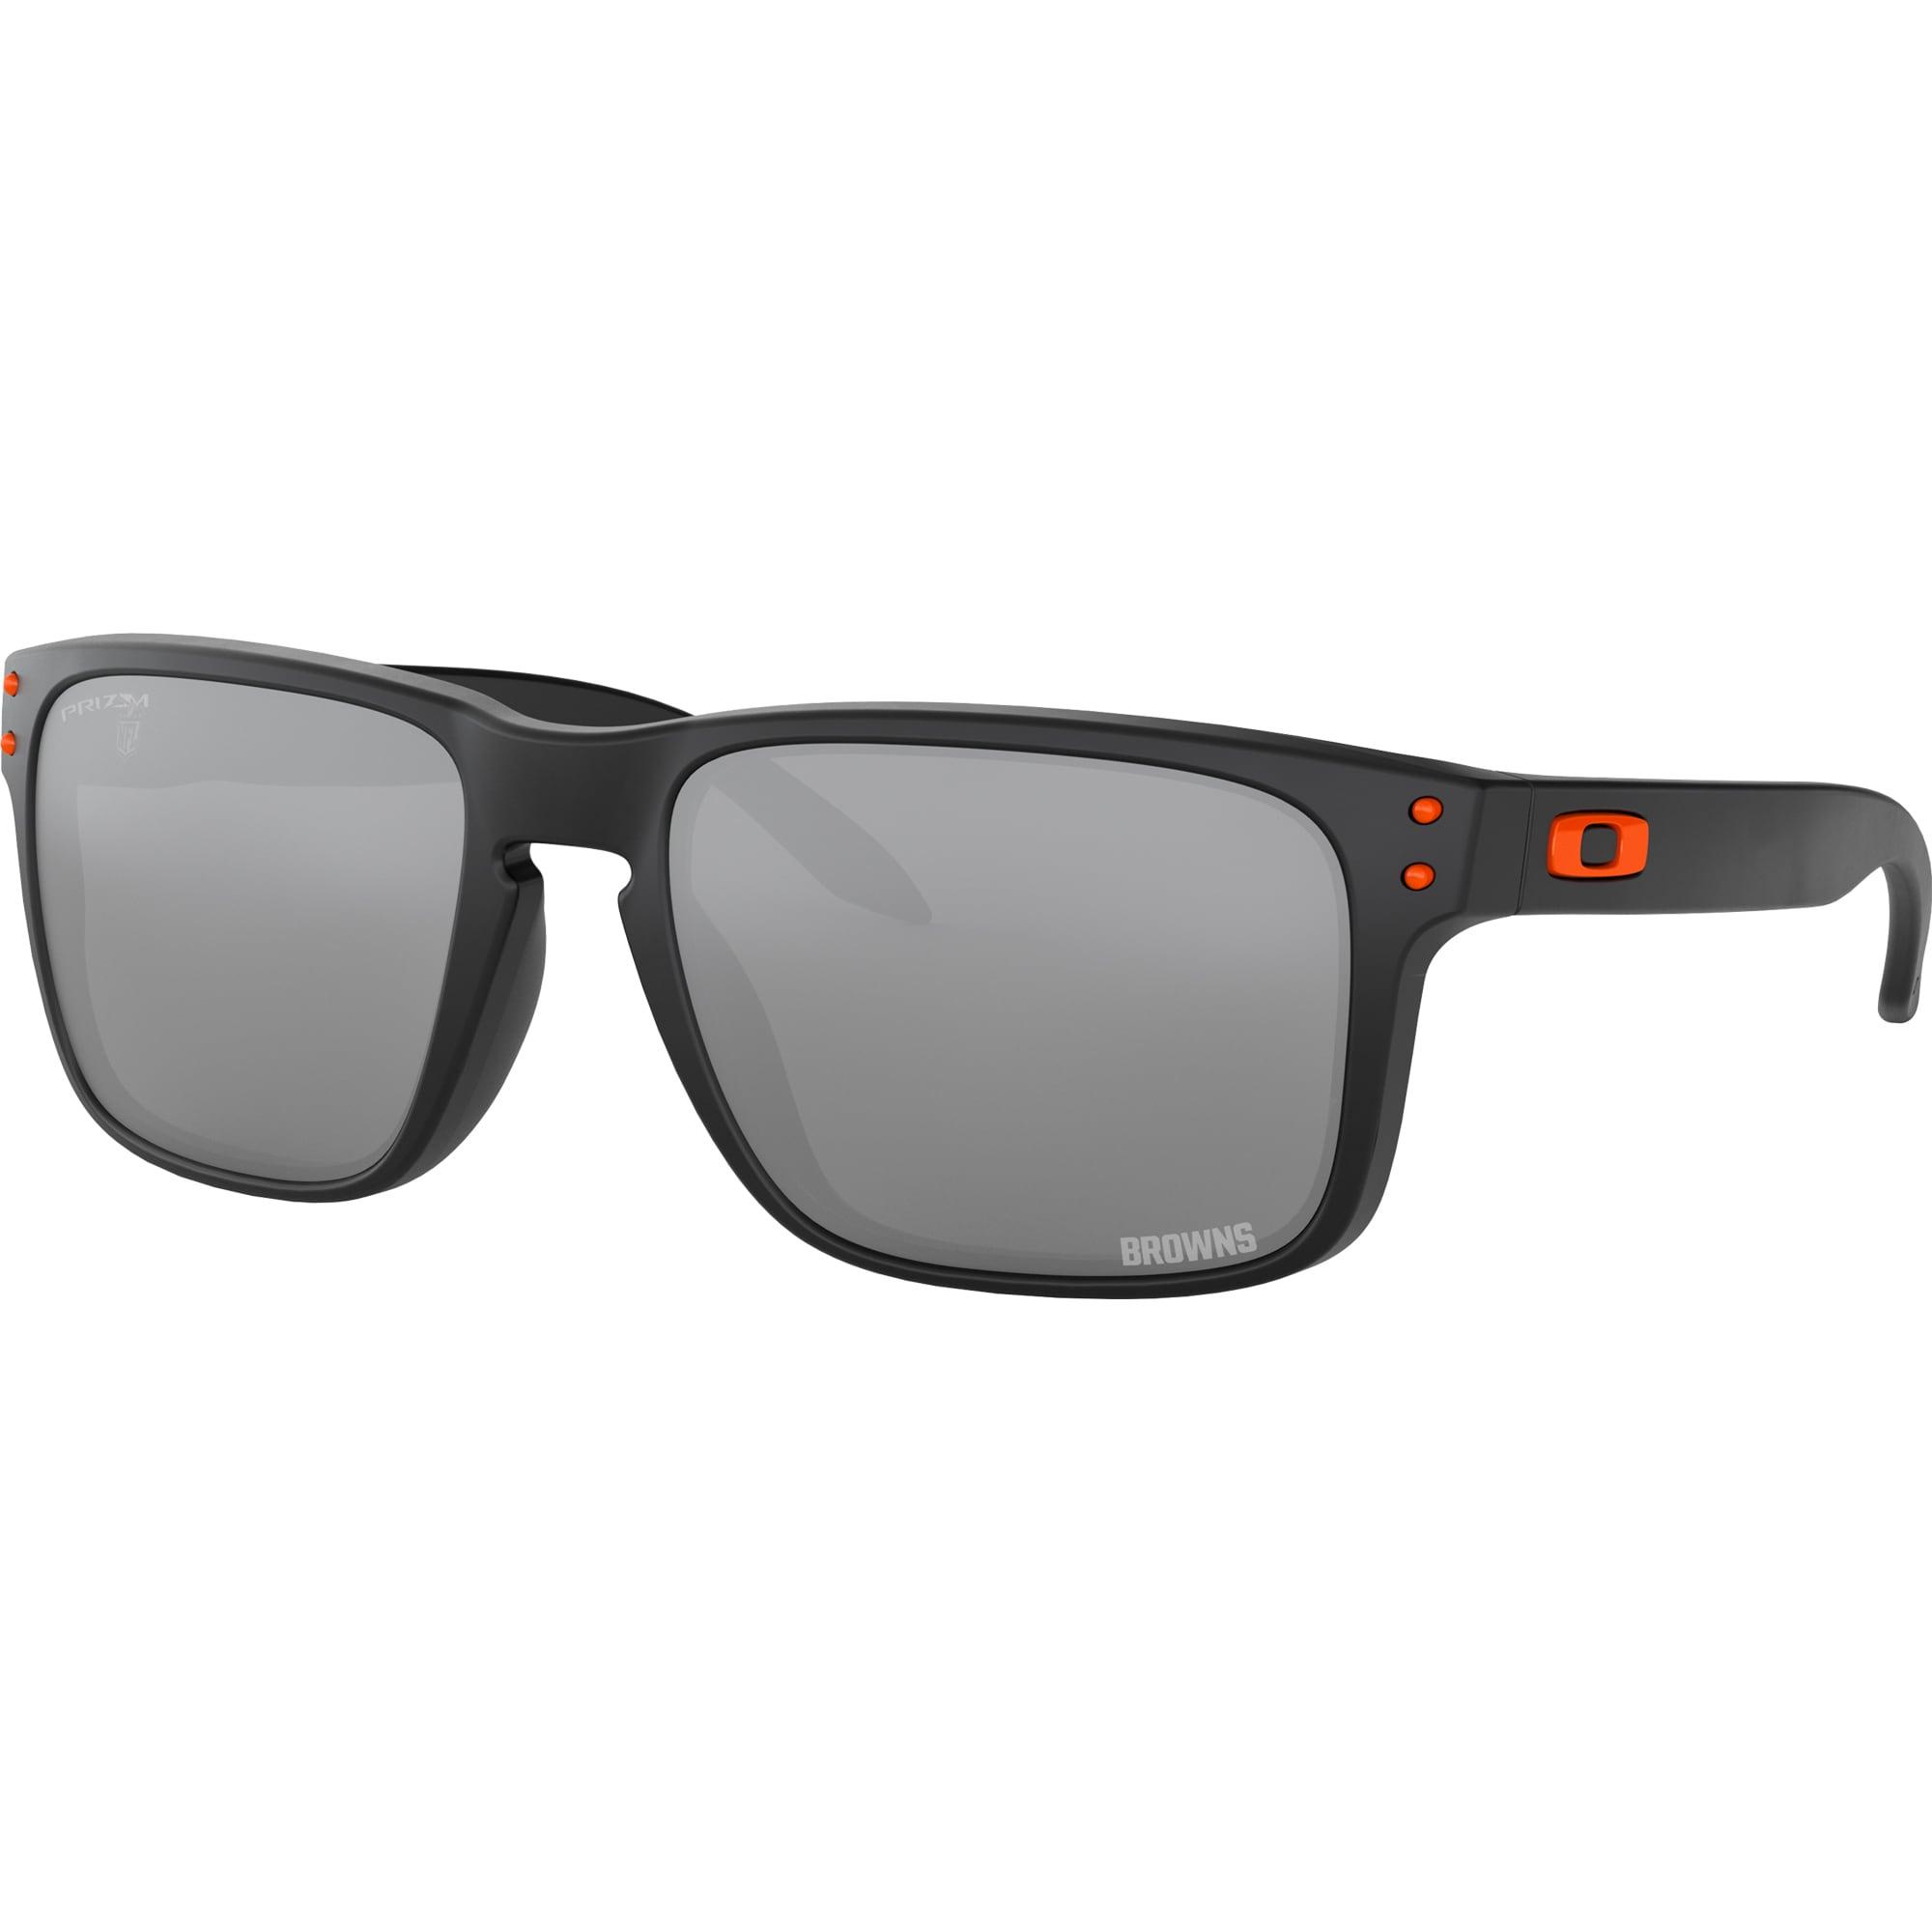 Cleveland Browns Oakley Holbrook Sunglasses